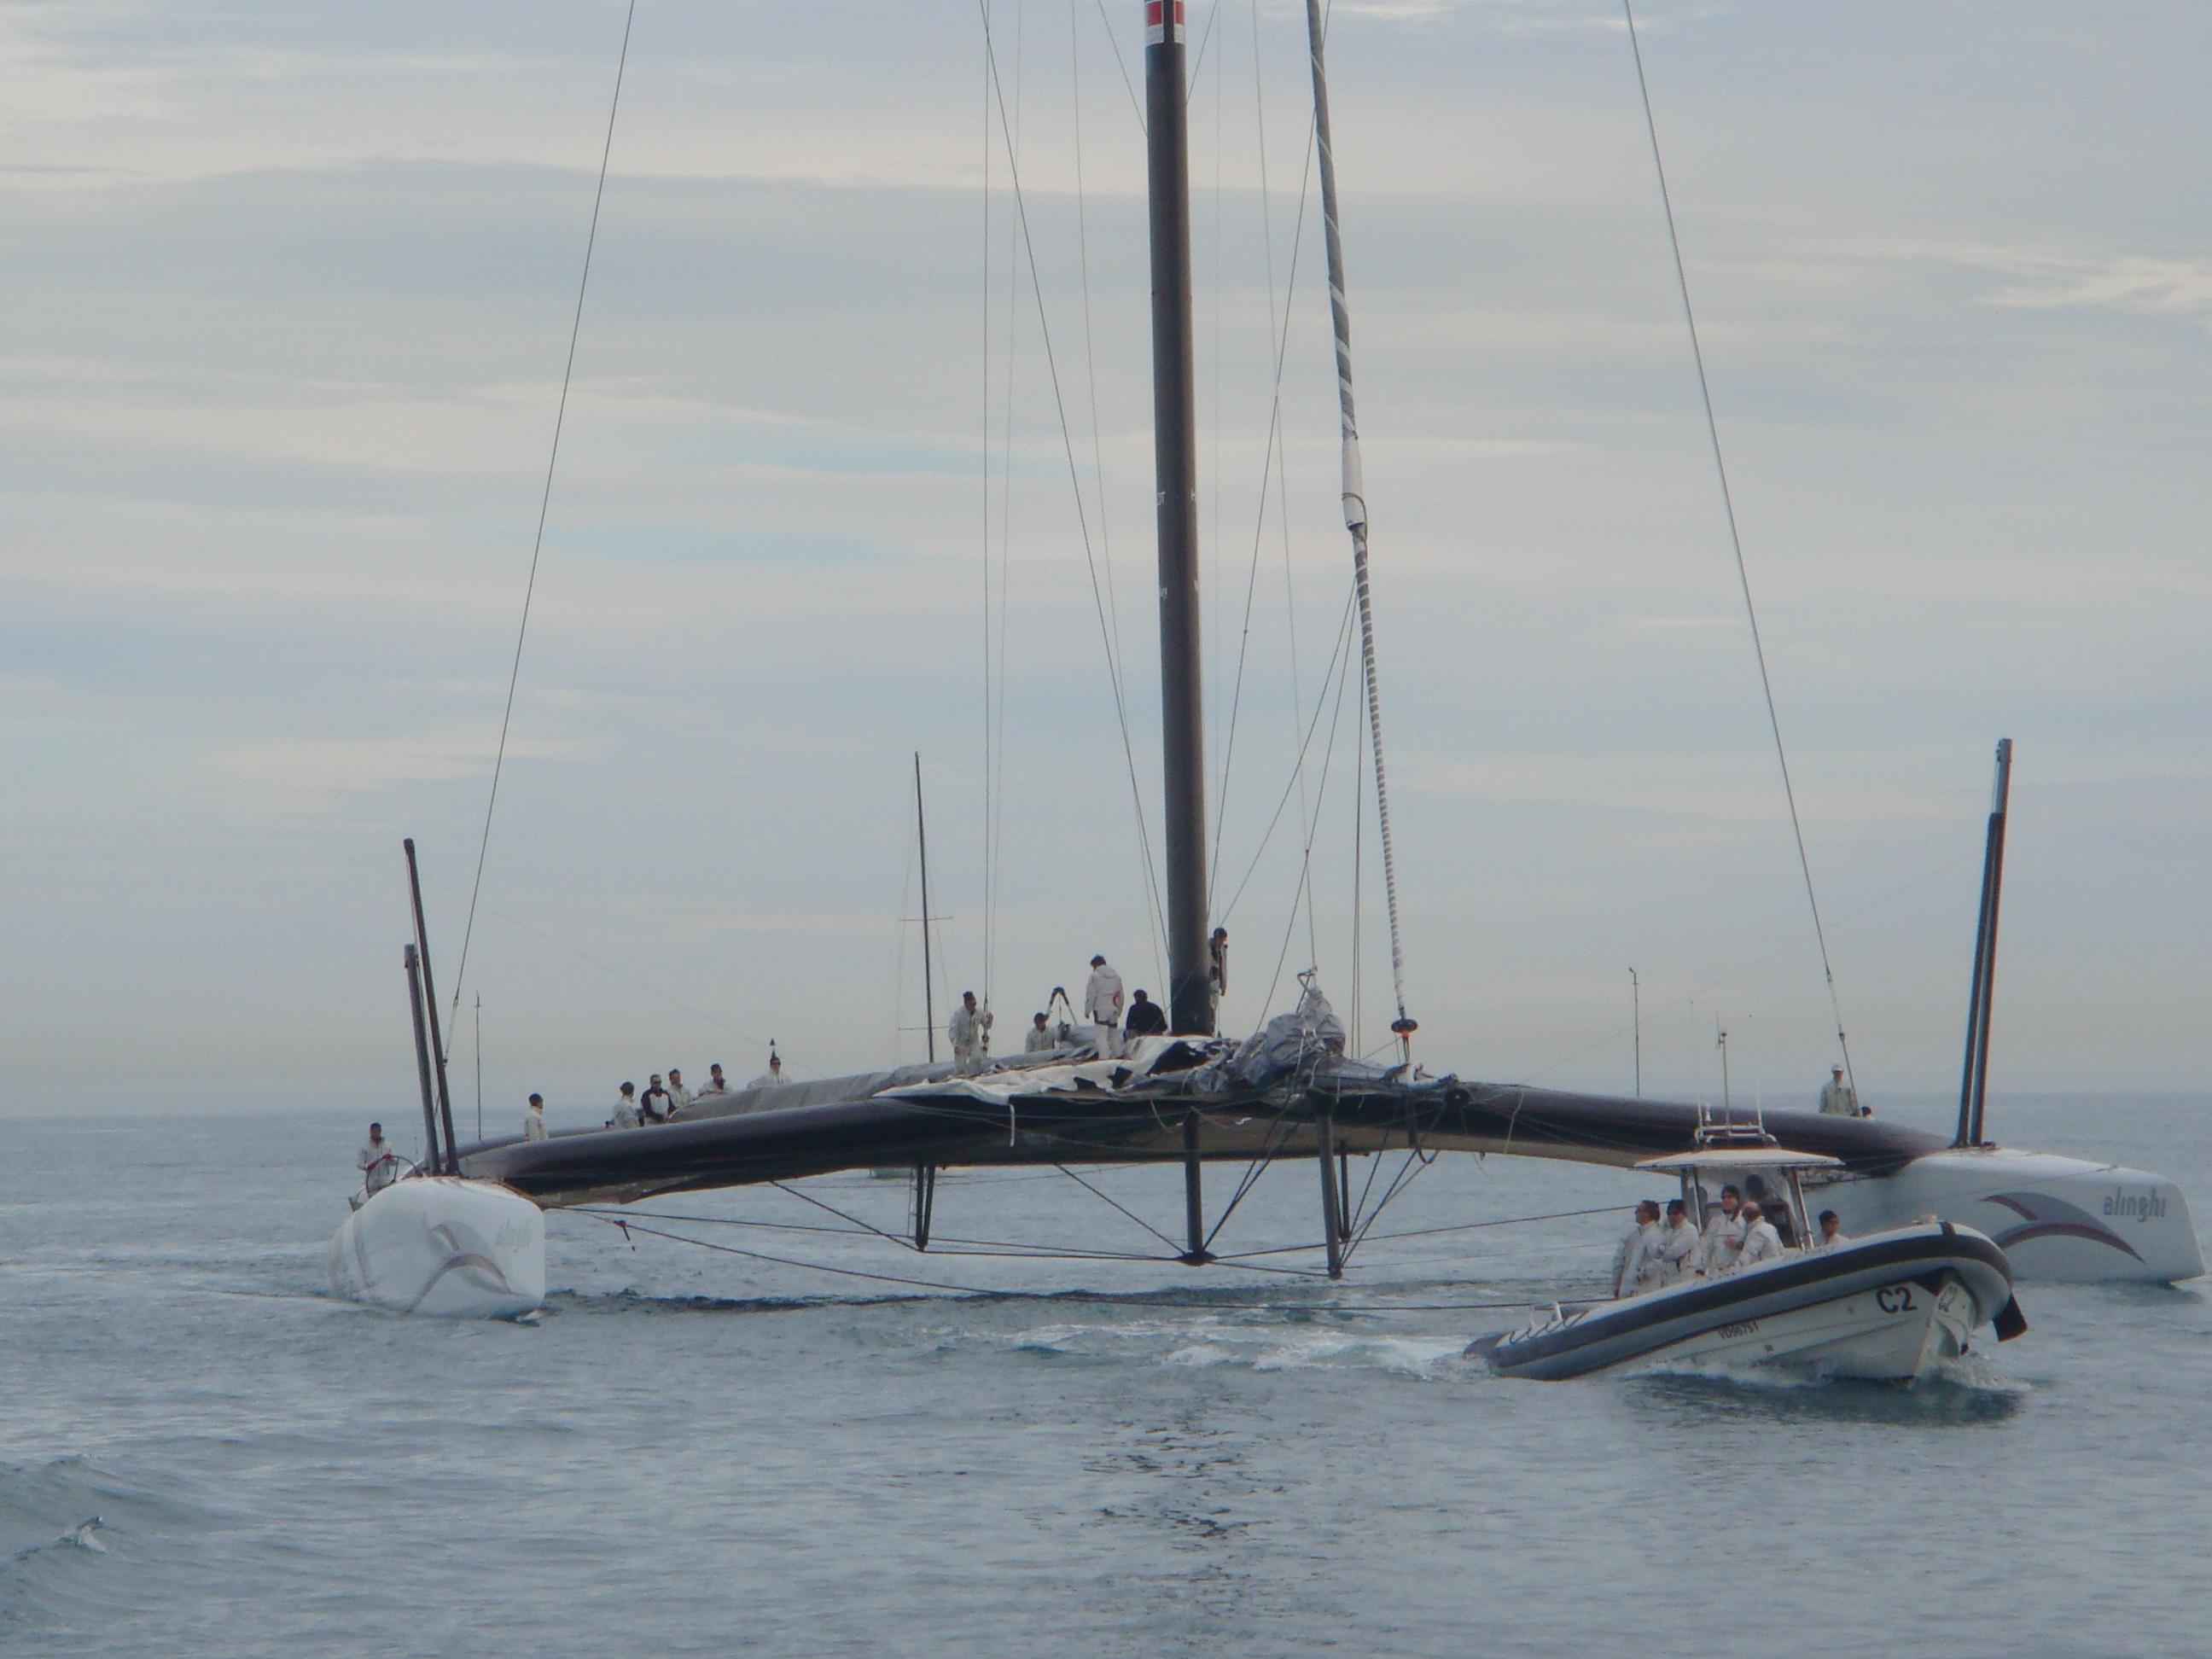 Alinghi - our favourite catamaran